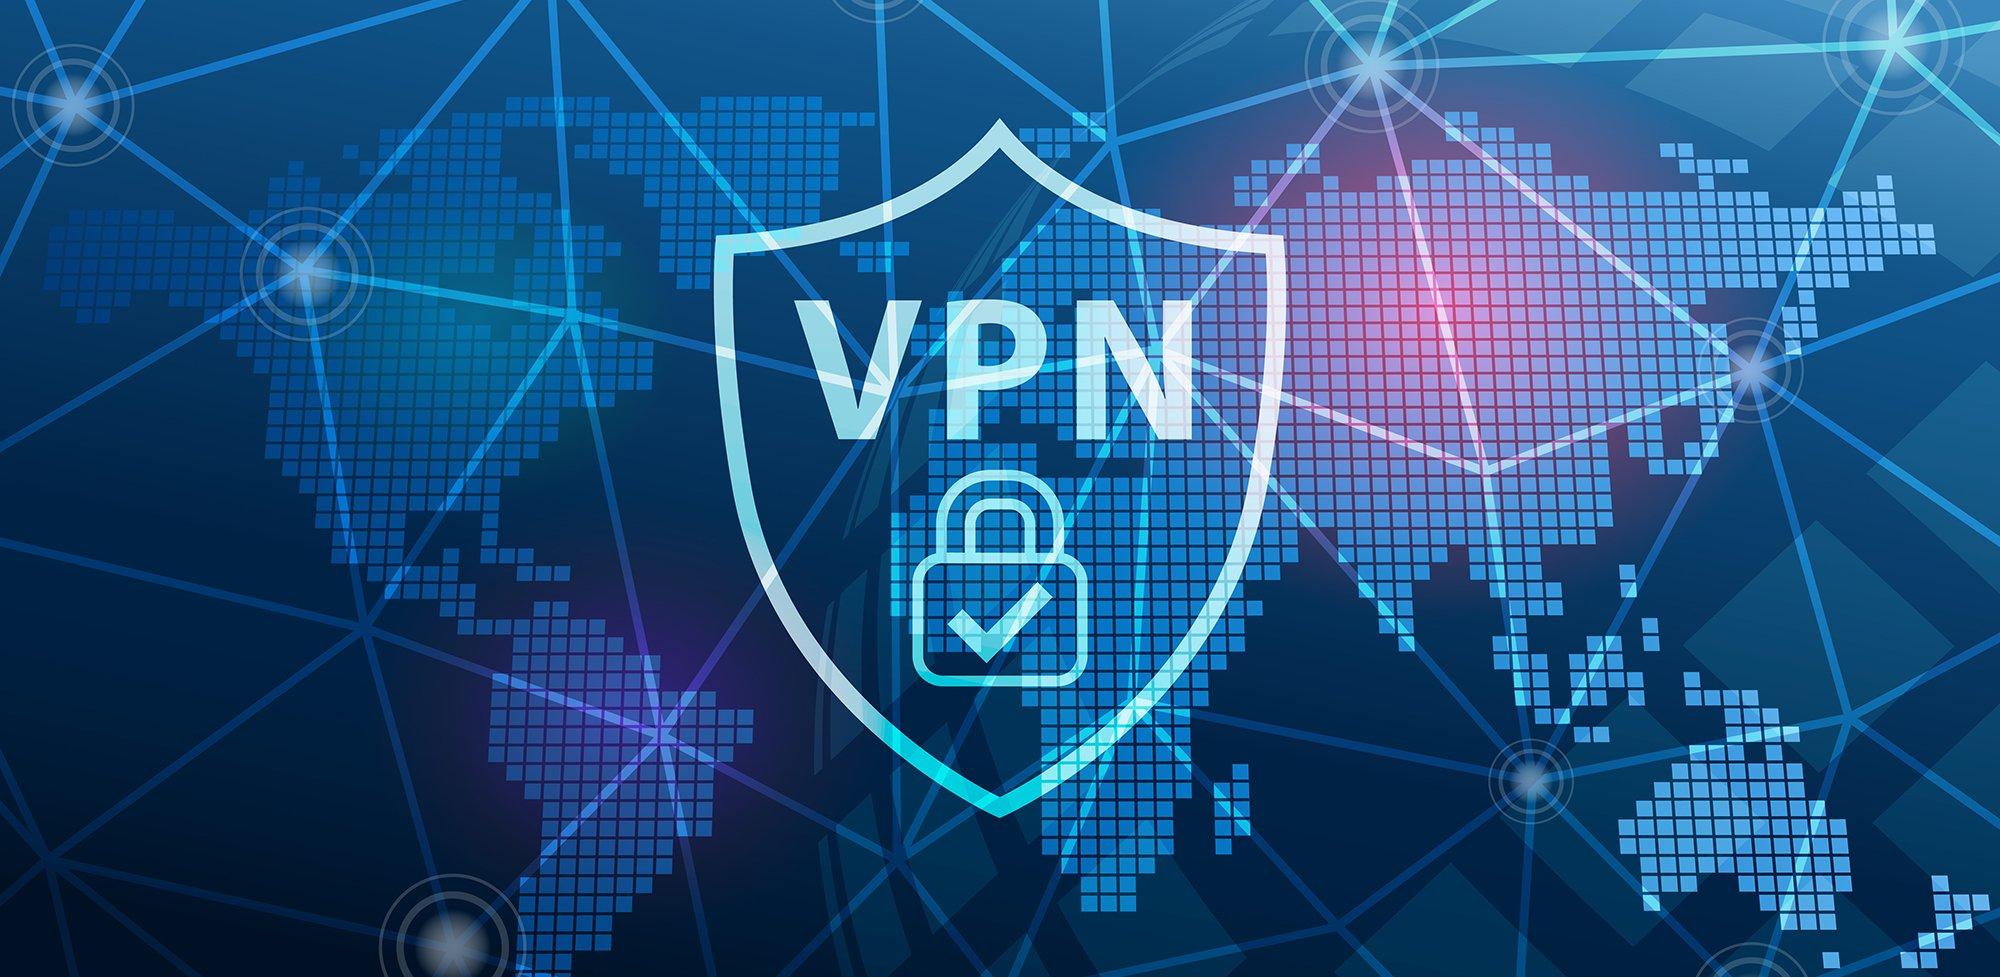 VPN hero image resized